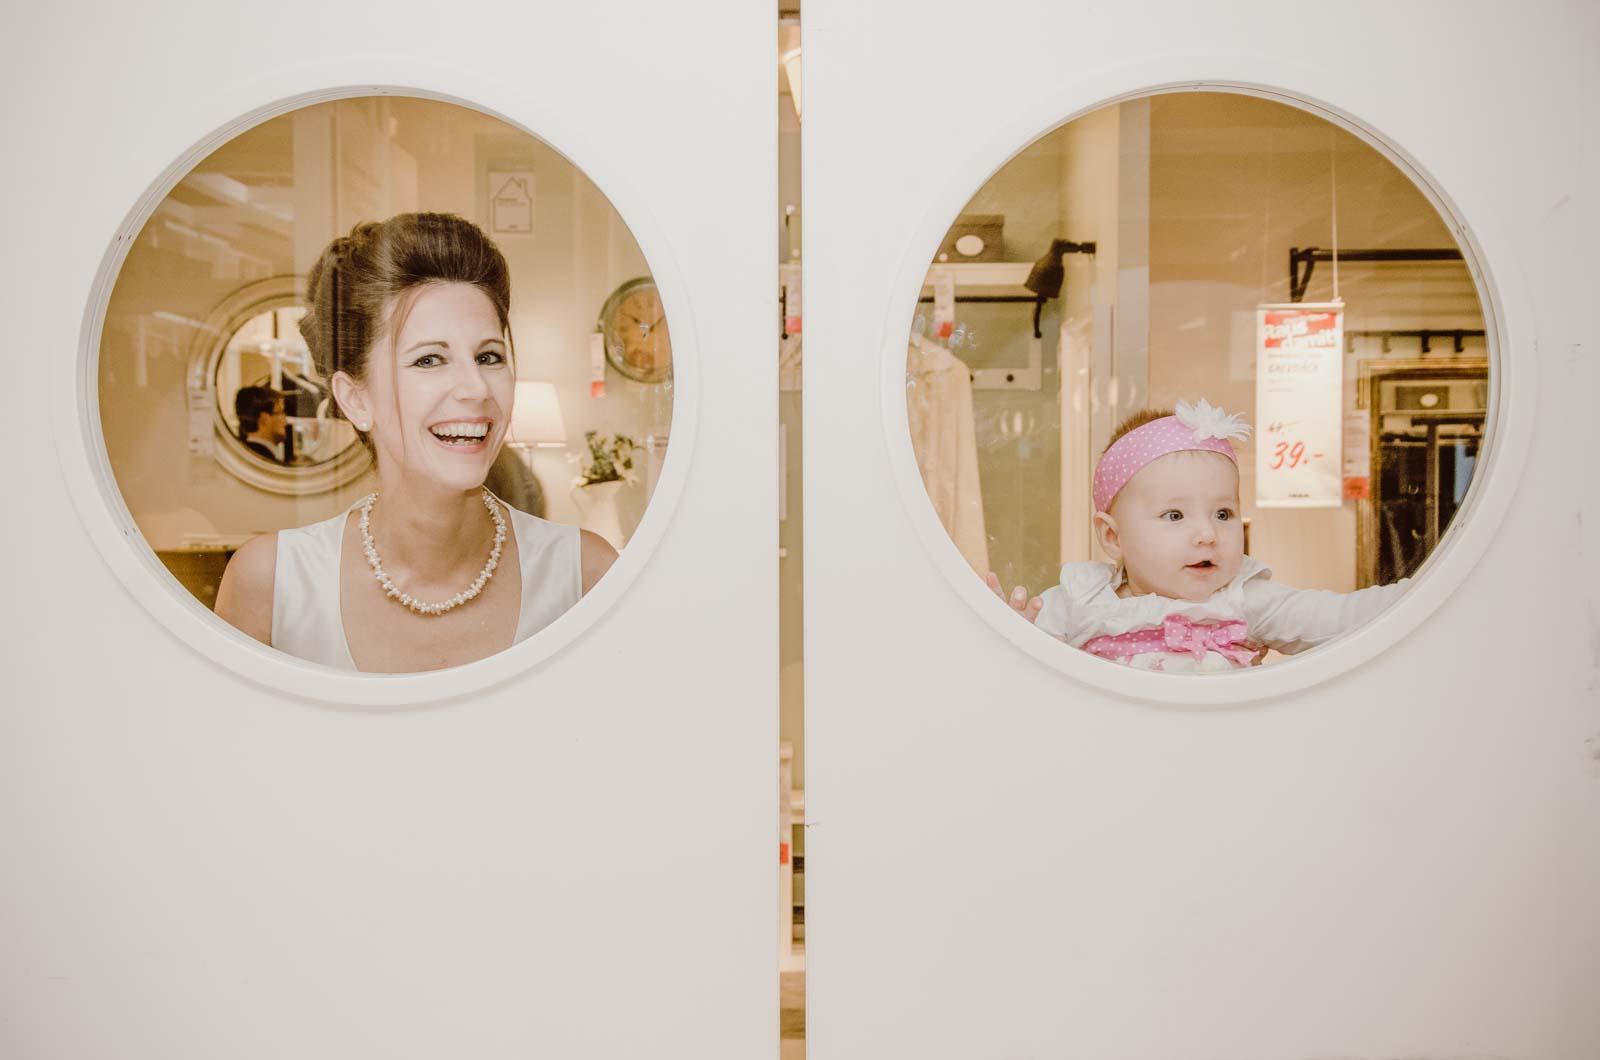 hochzeit ikea heiraten flughafen koeln ossendorf hochzeitsfotograf koeln 50 jenny egerer k ln. Black Bedroom Furniture Sets. Home Design Ideas